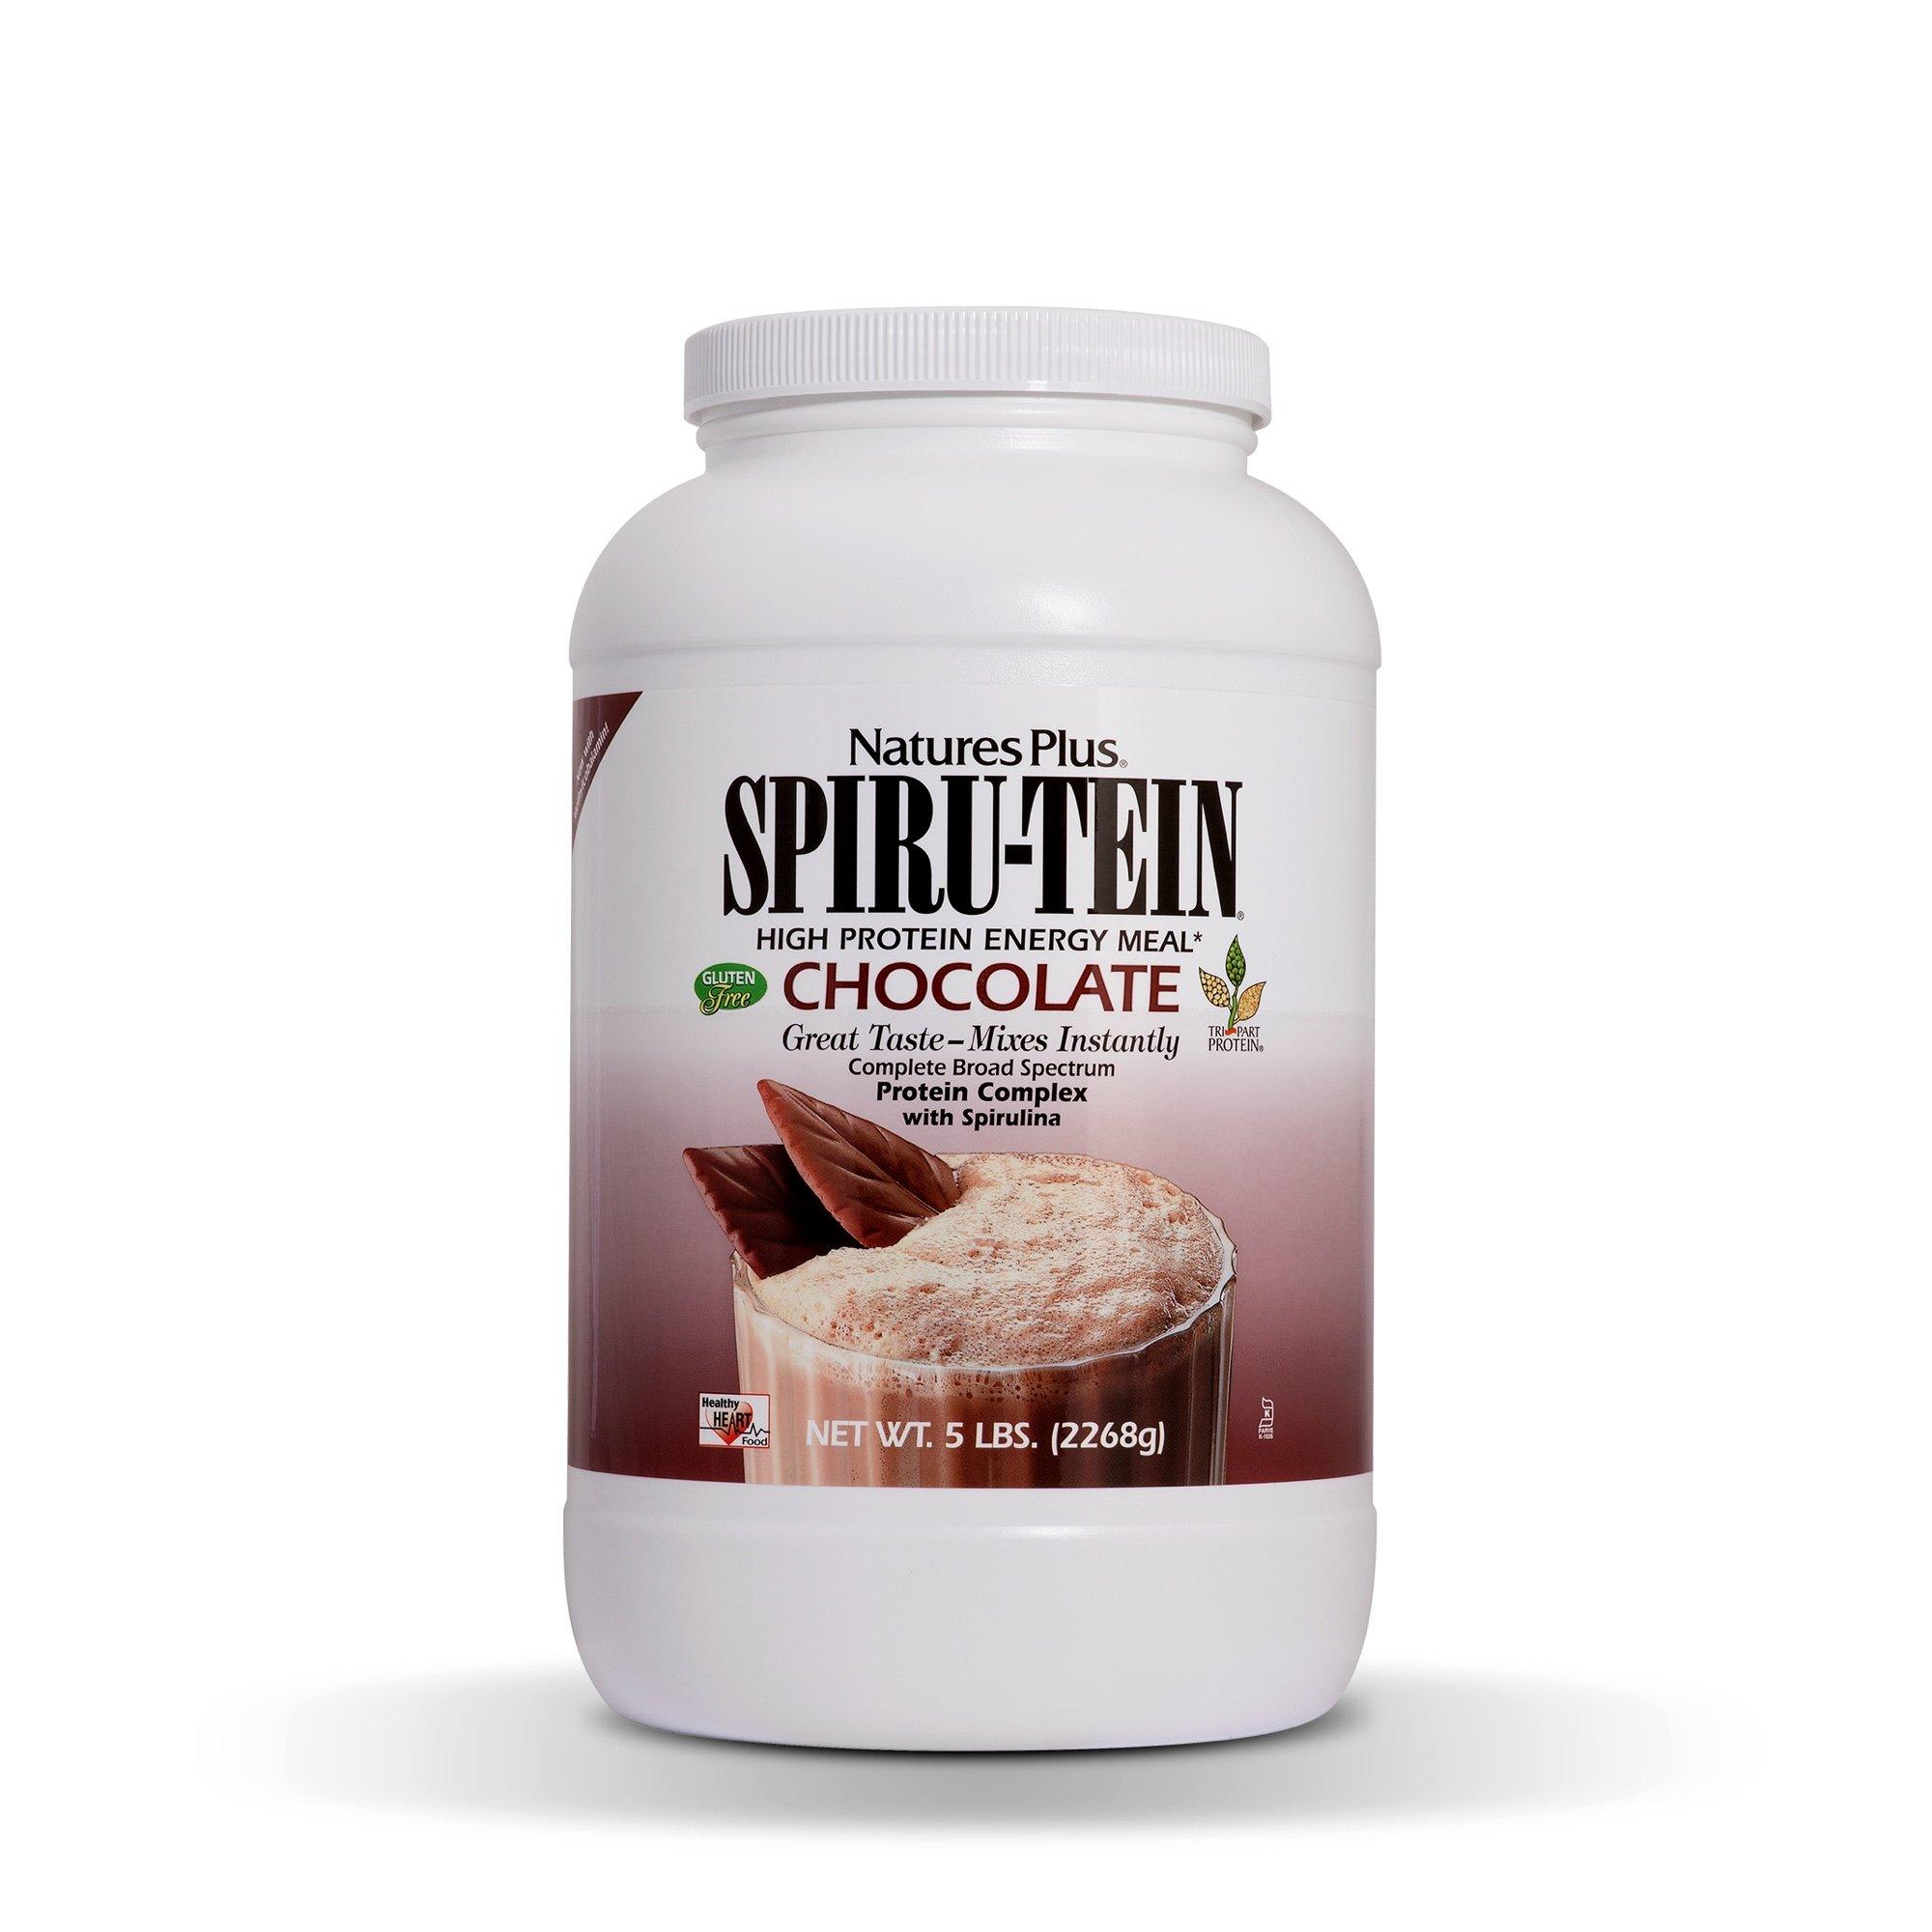 Nature's Plus - Chocolate SPIRU-TEIN Shake, 5 lbs Powder